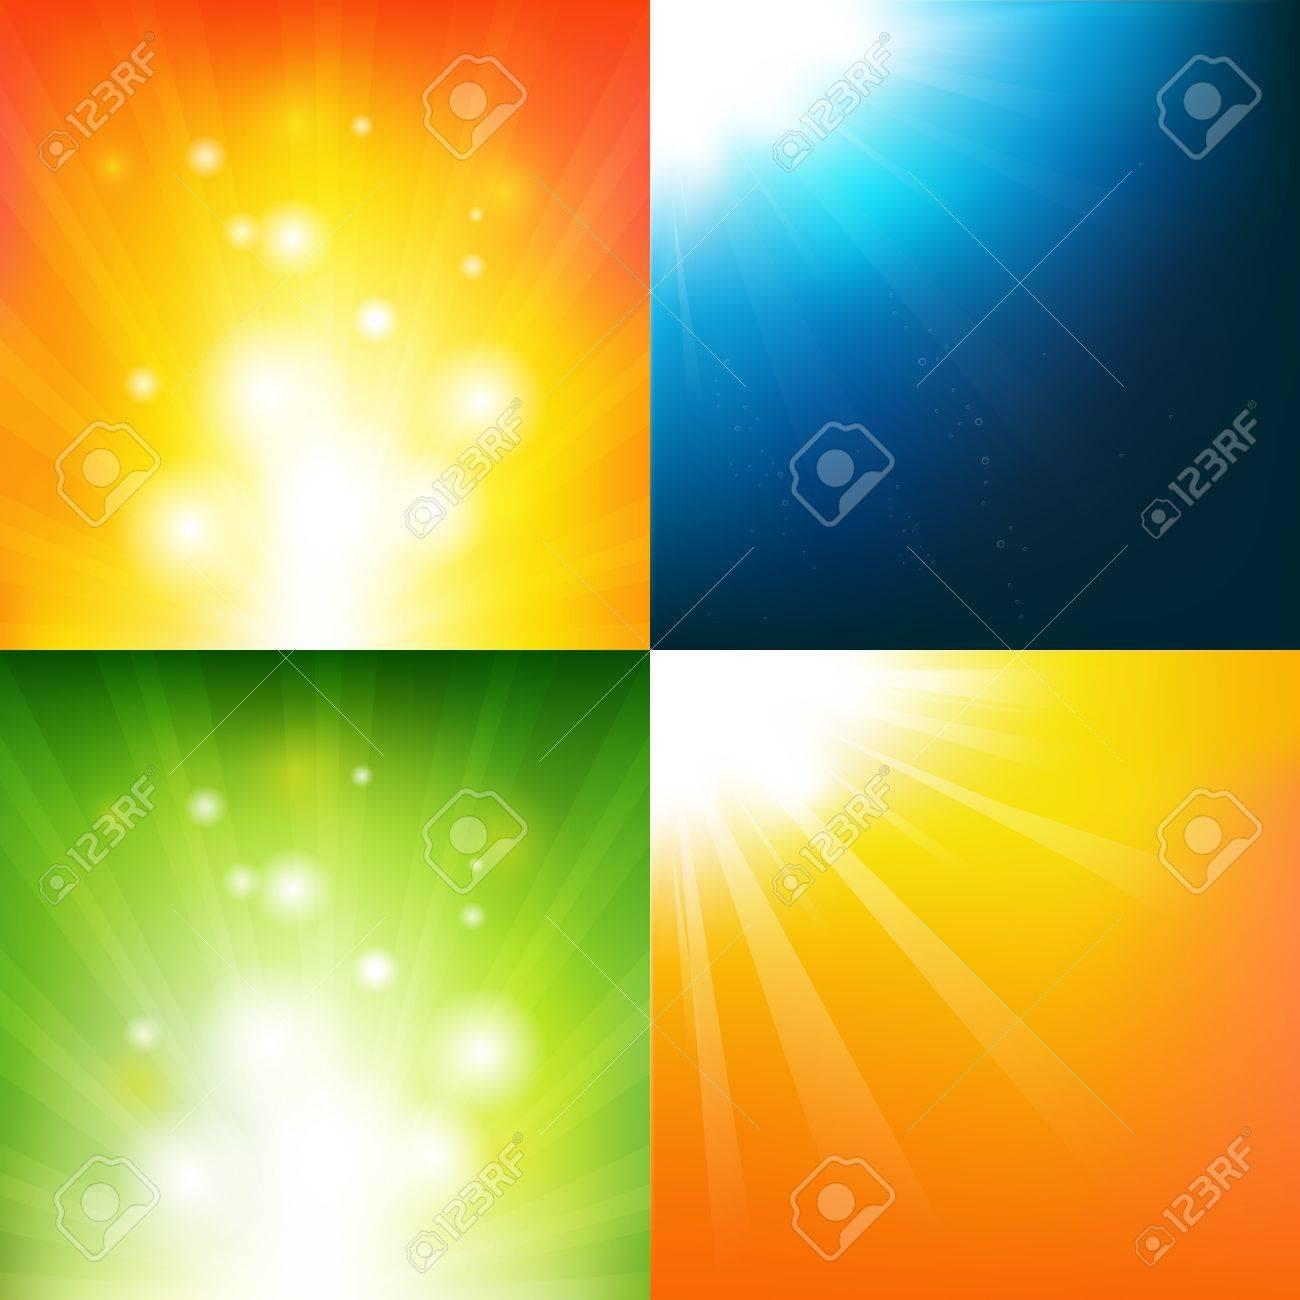 4 Underwater And Sunburst Backgrounds, Vector Background Stock Vector - 12491342